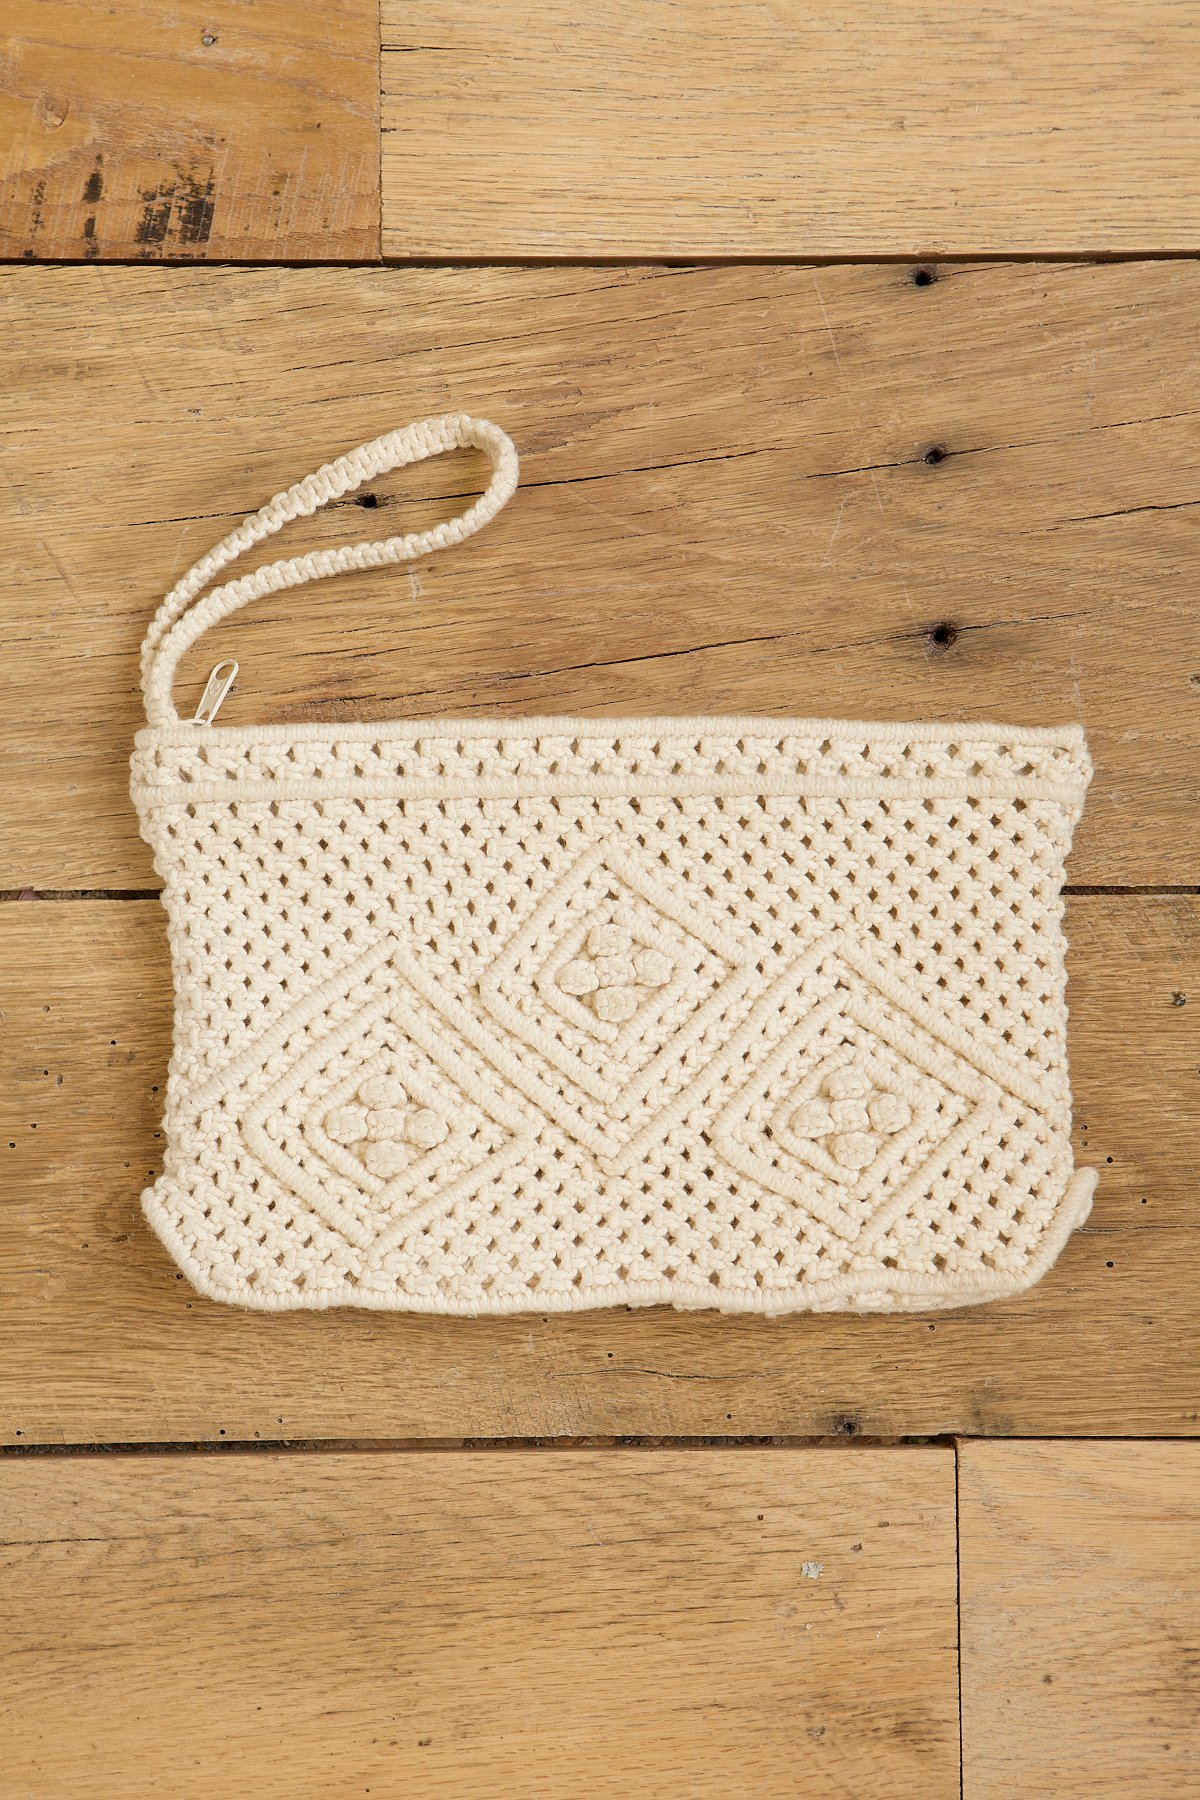 Vintage Macrame Wrist Bag